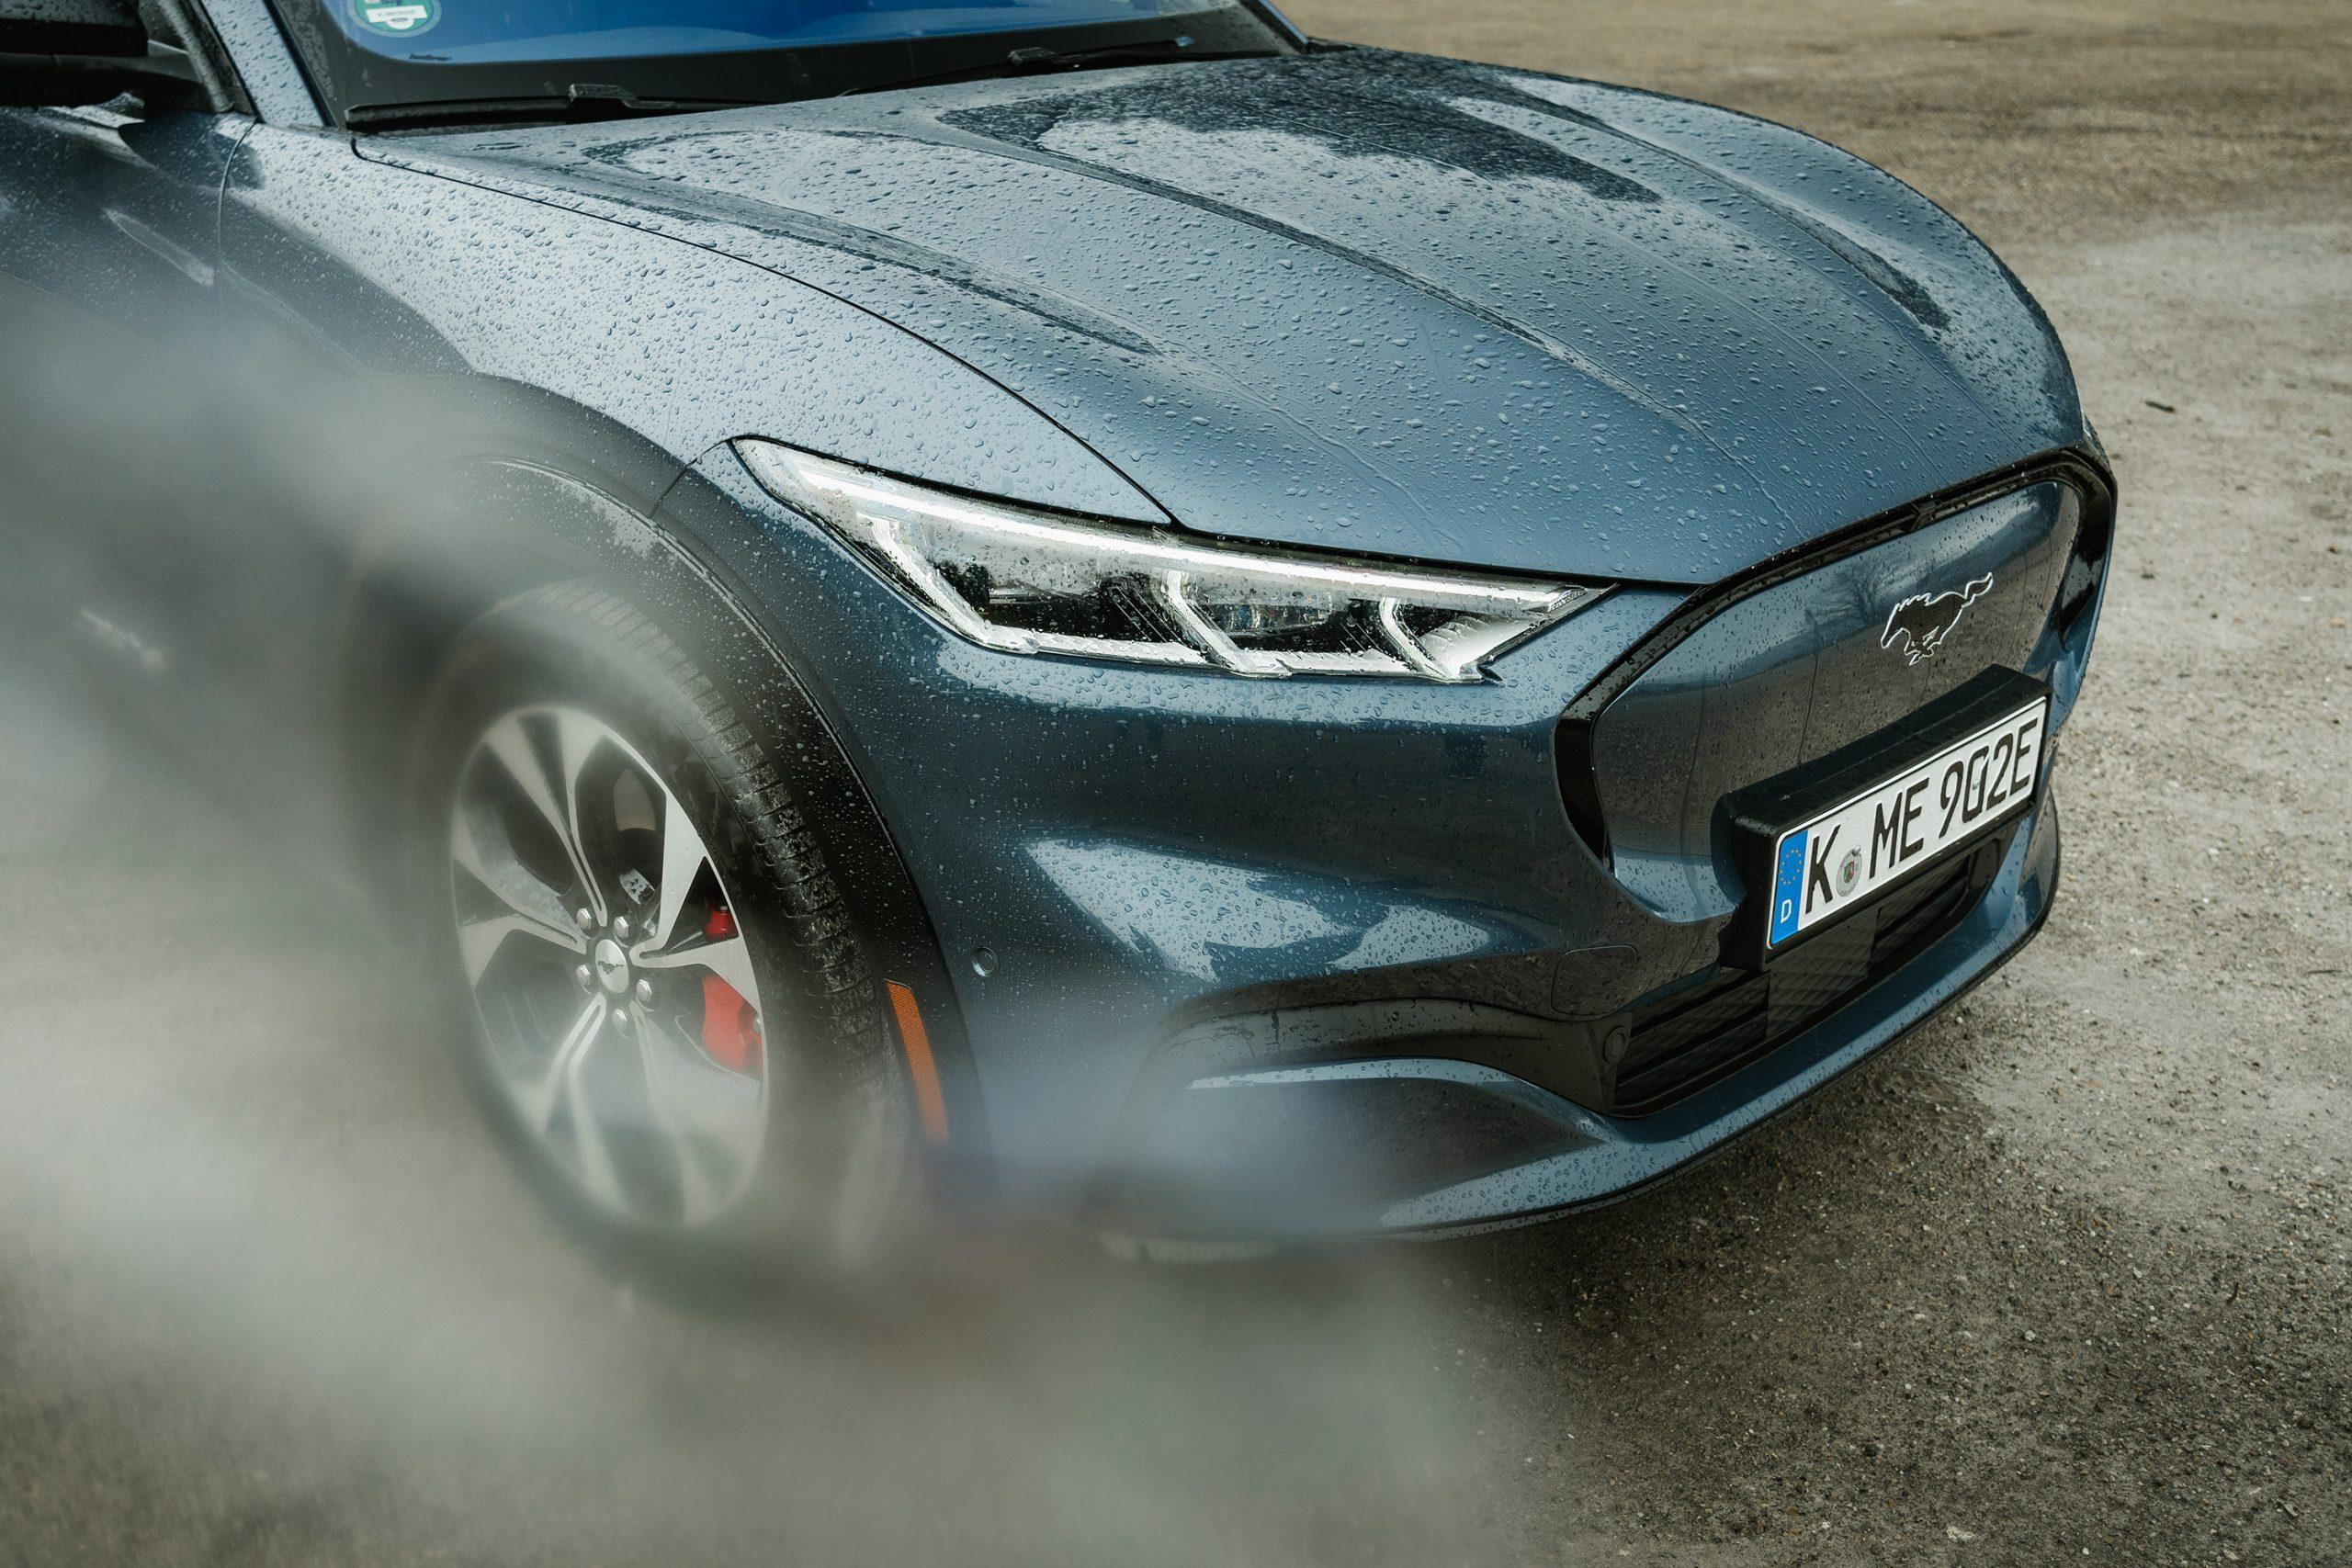 Mustang Mach-E, copyright Jpog.fr